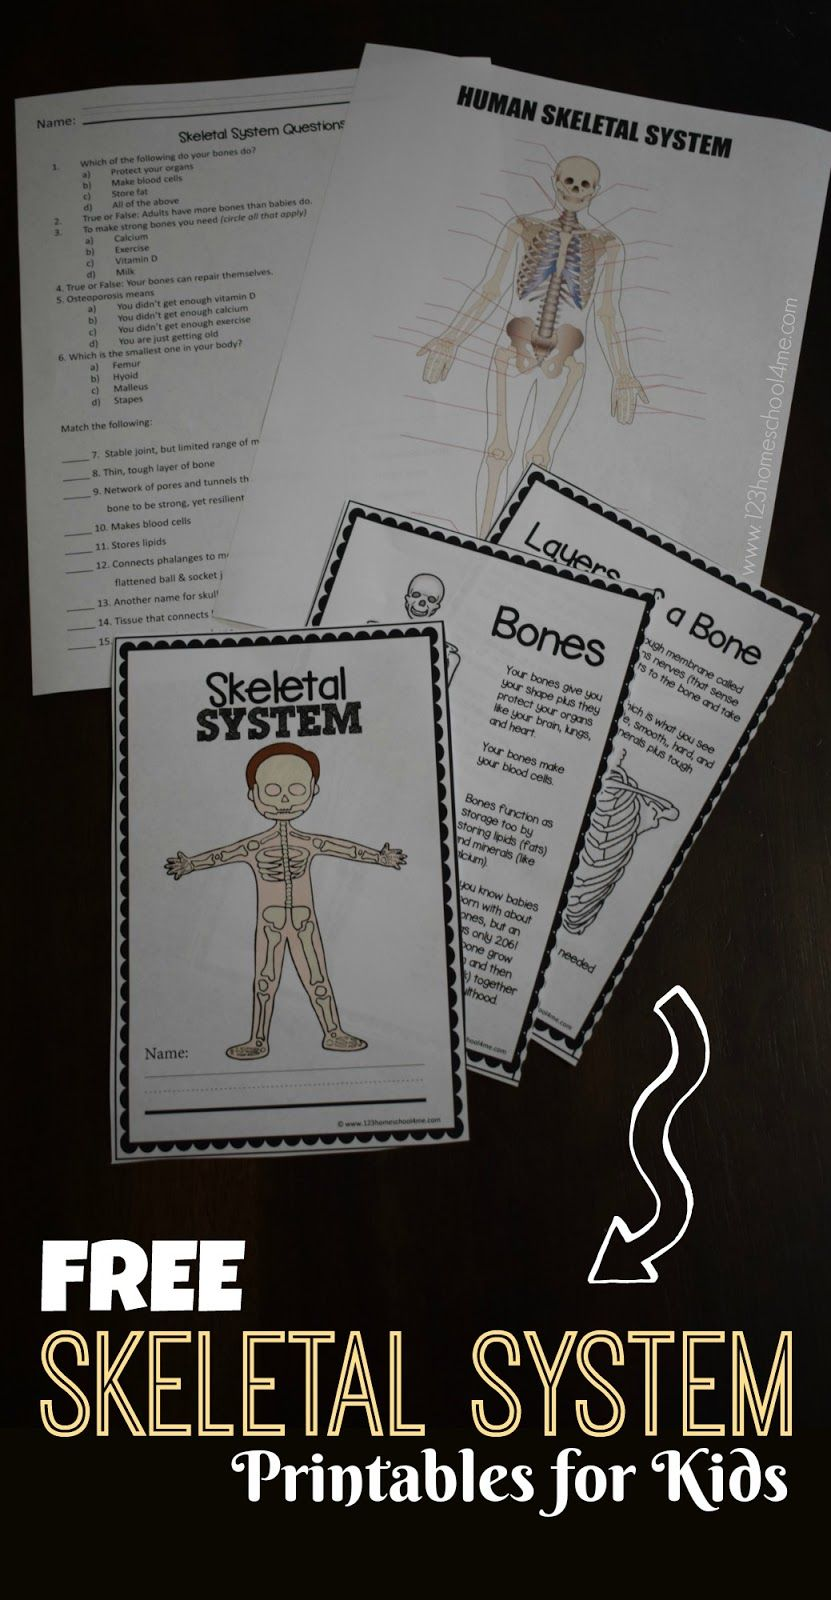 FREE SKeletal System for Kids Worksheets perfect for ...